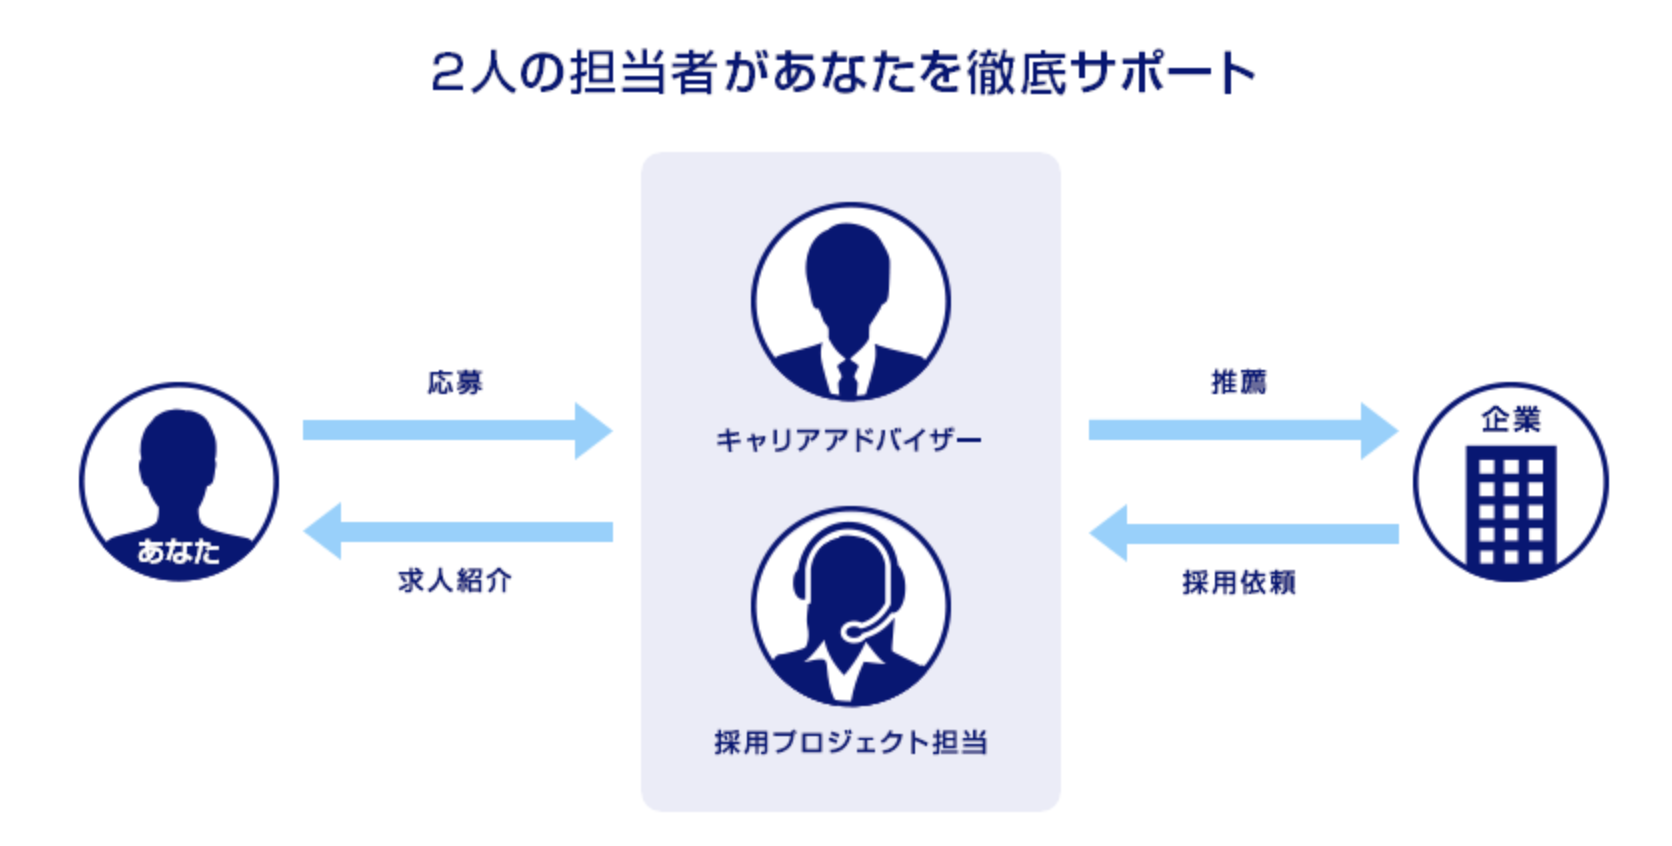 DODAのサポート体制